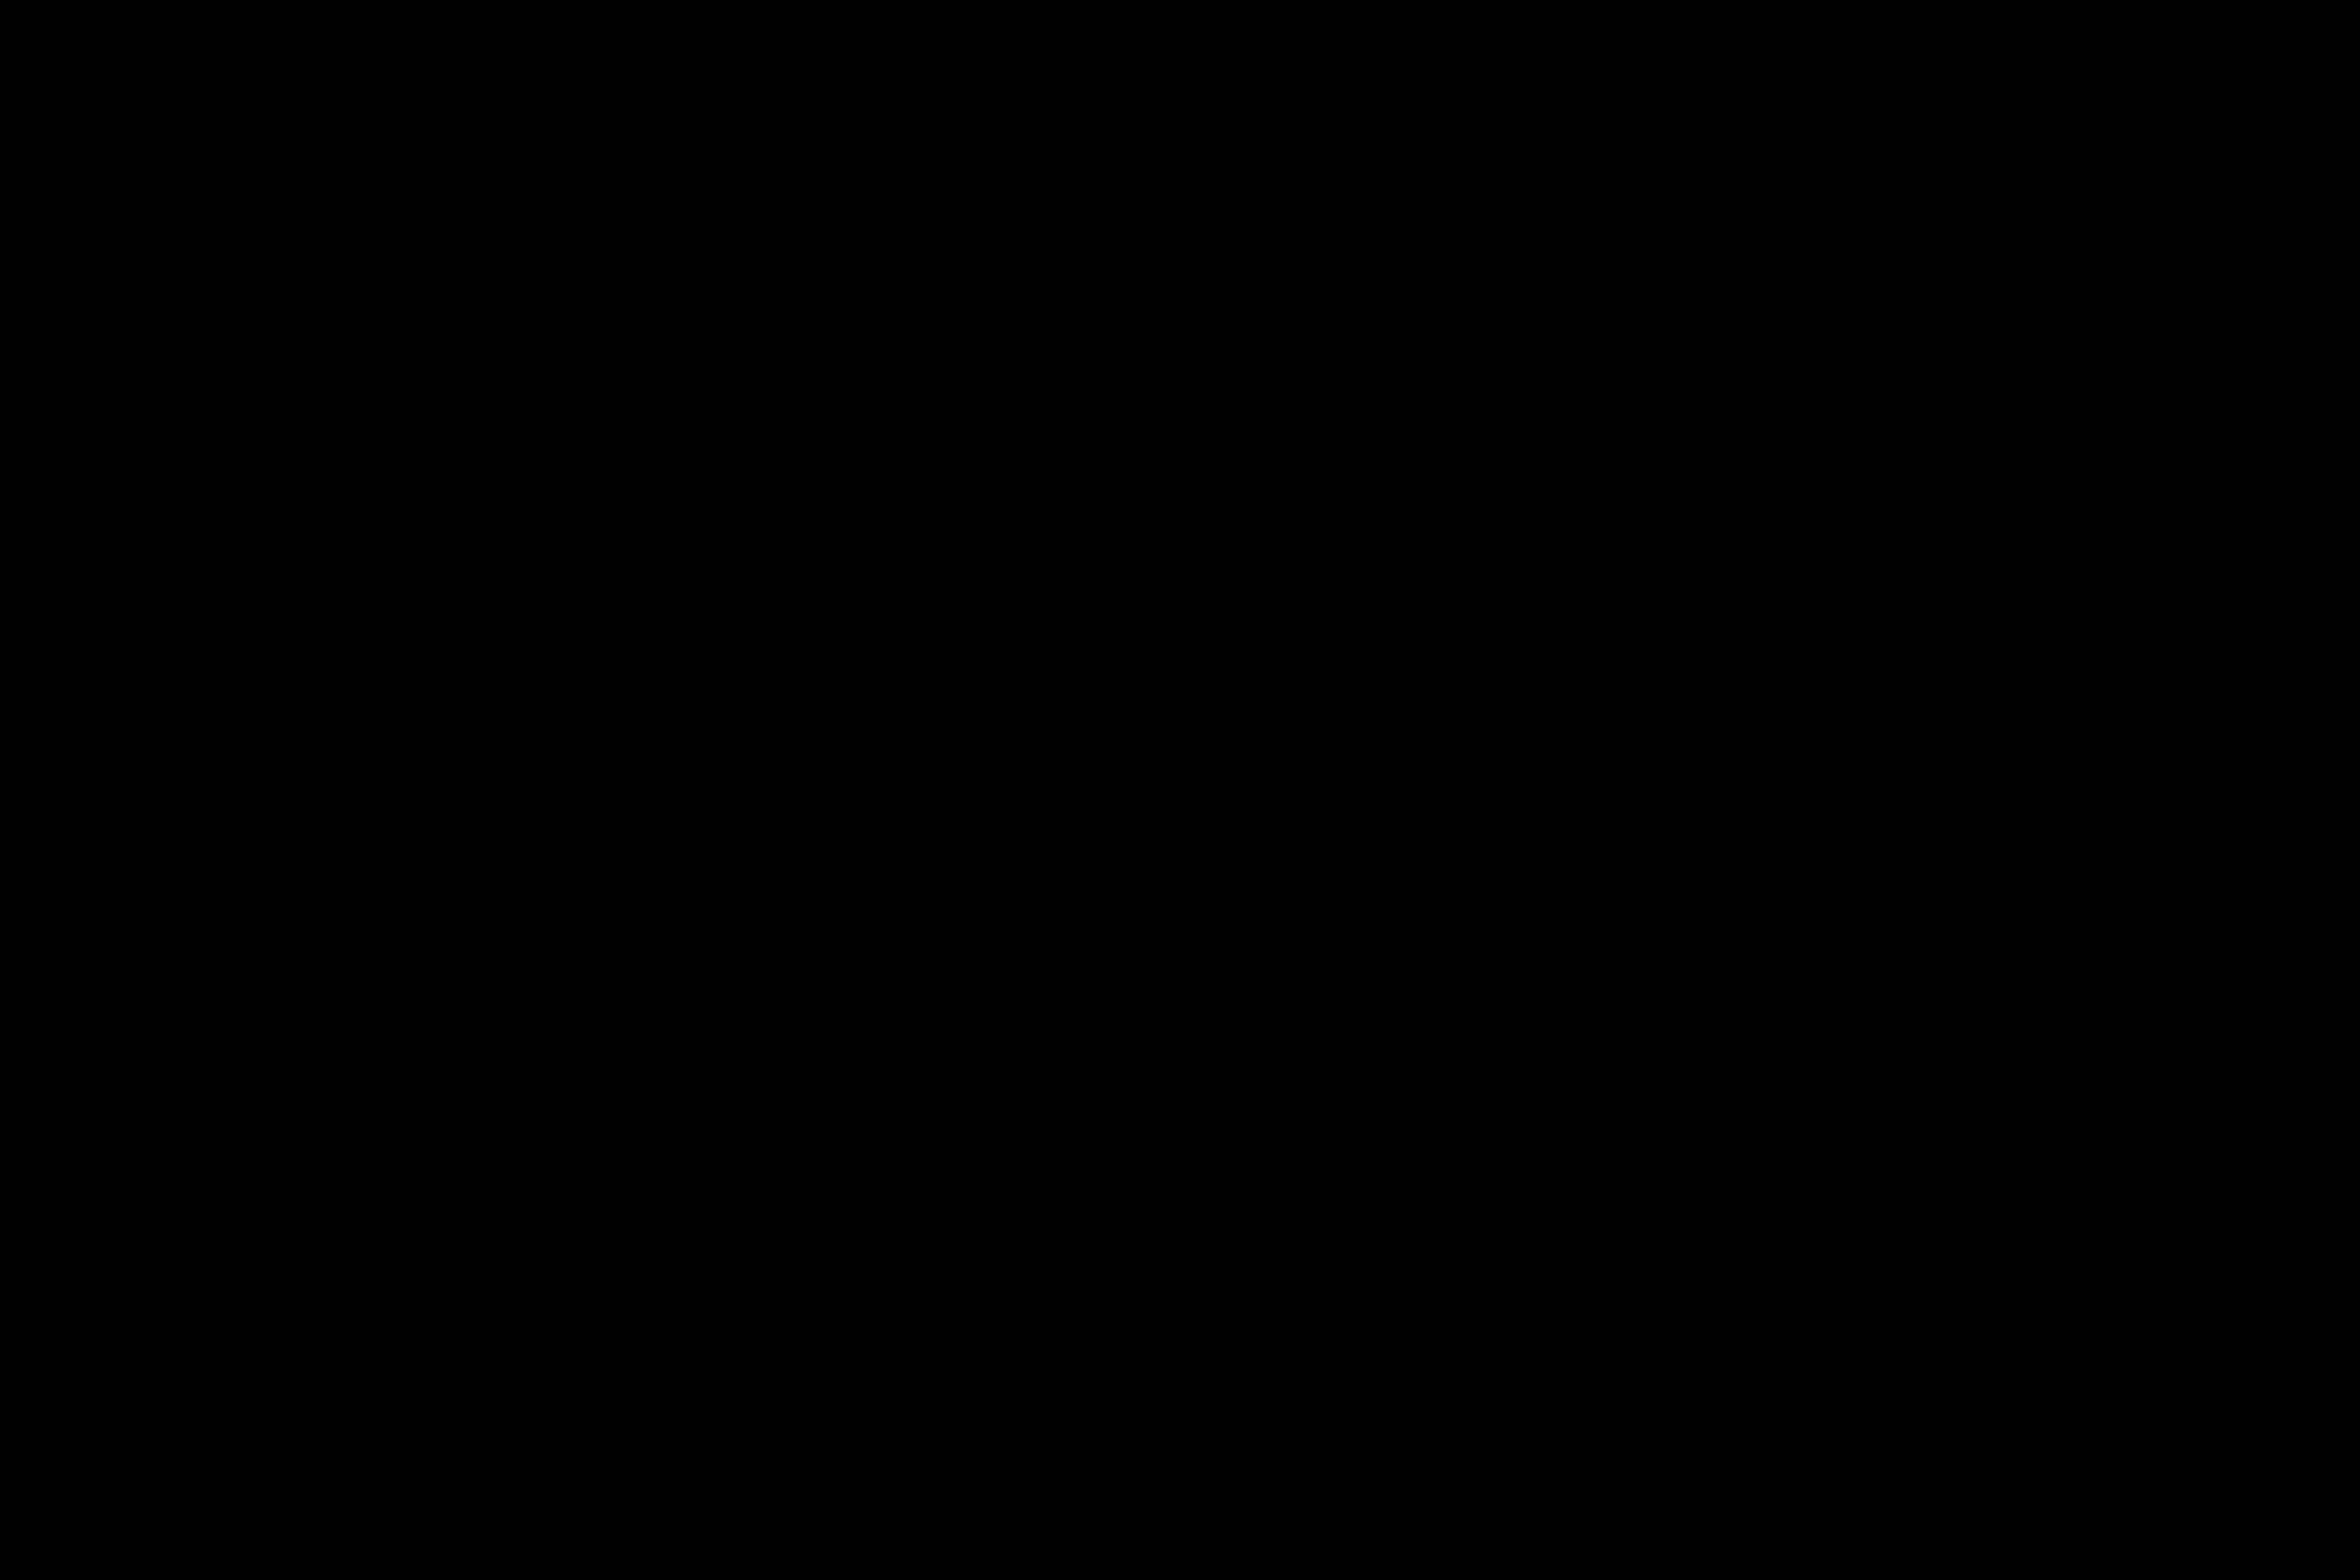 rj0449